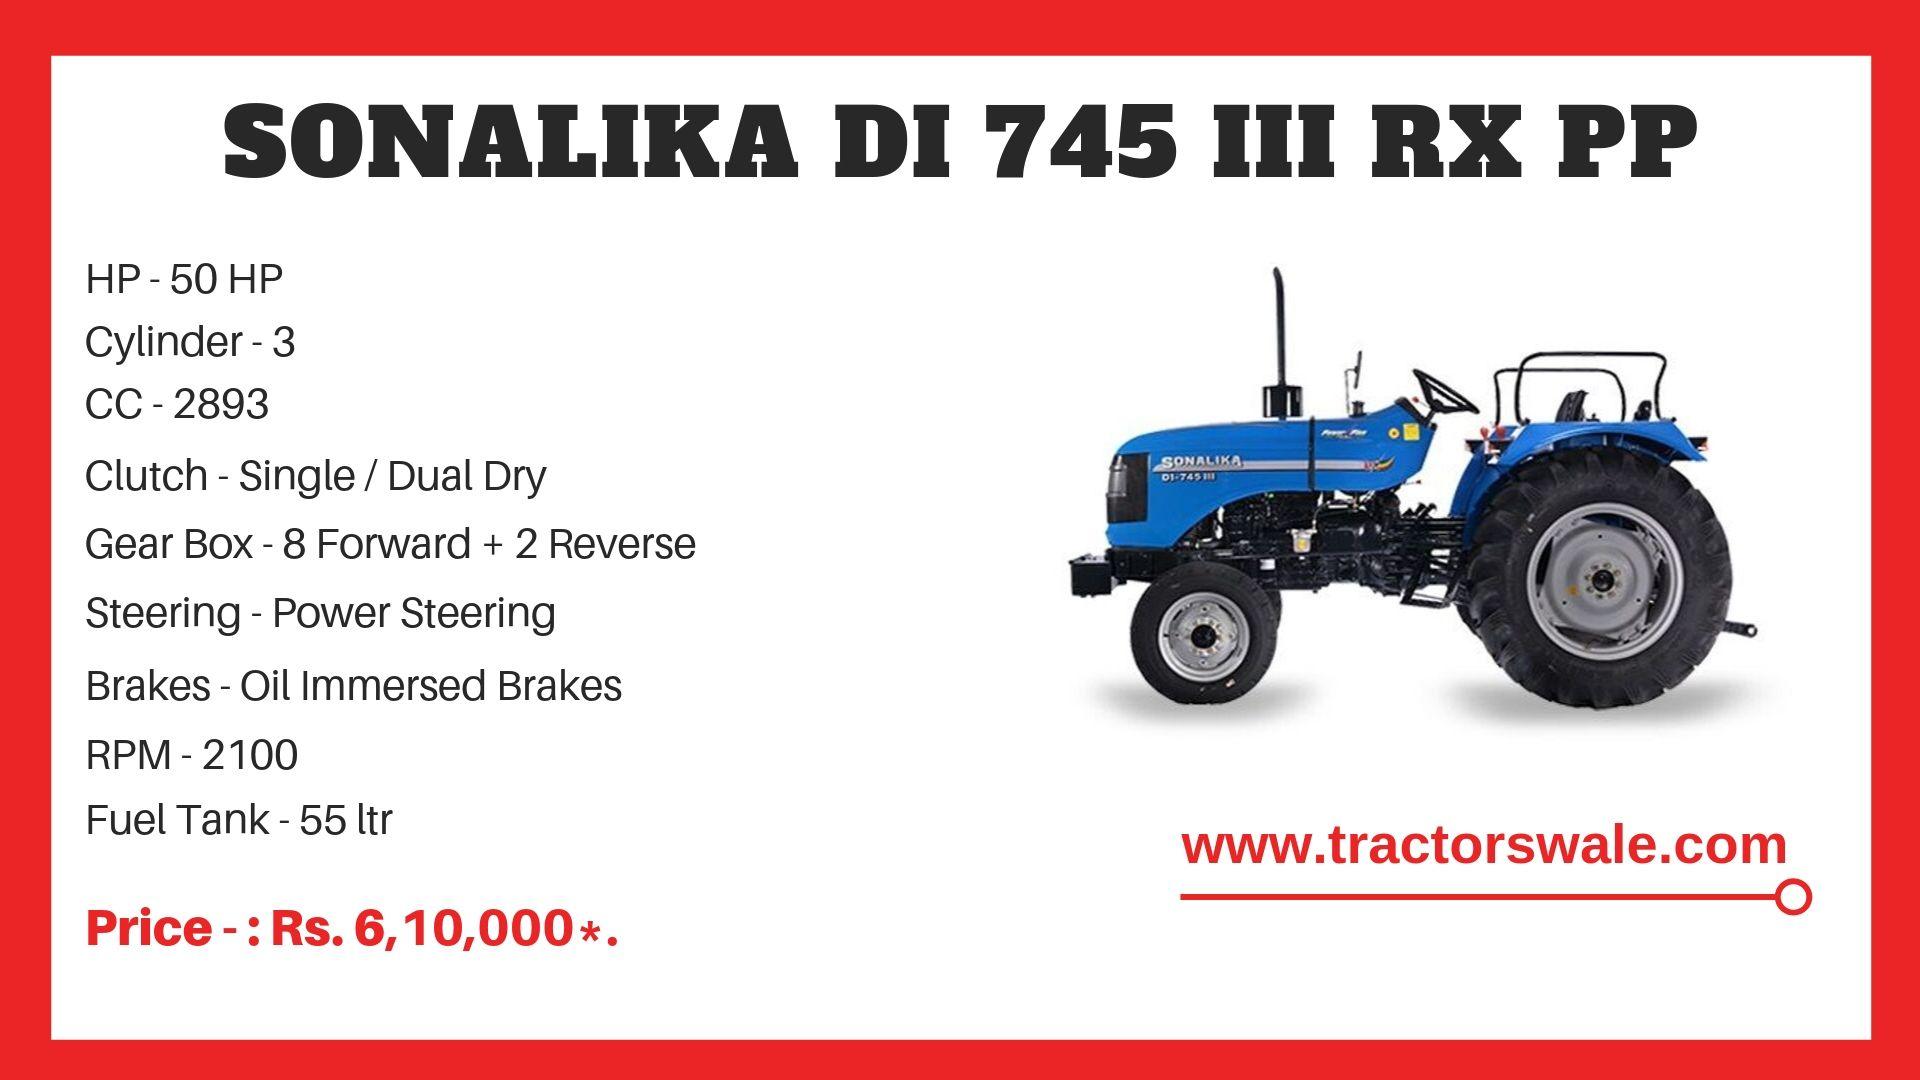 Sonalika DI 745 III RX PP tractor specs